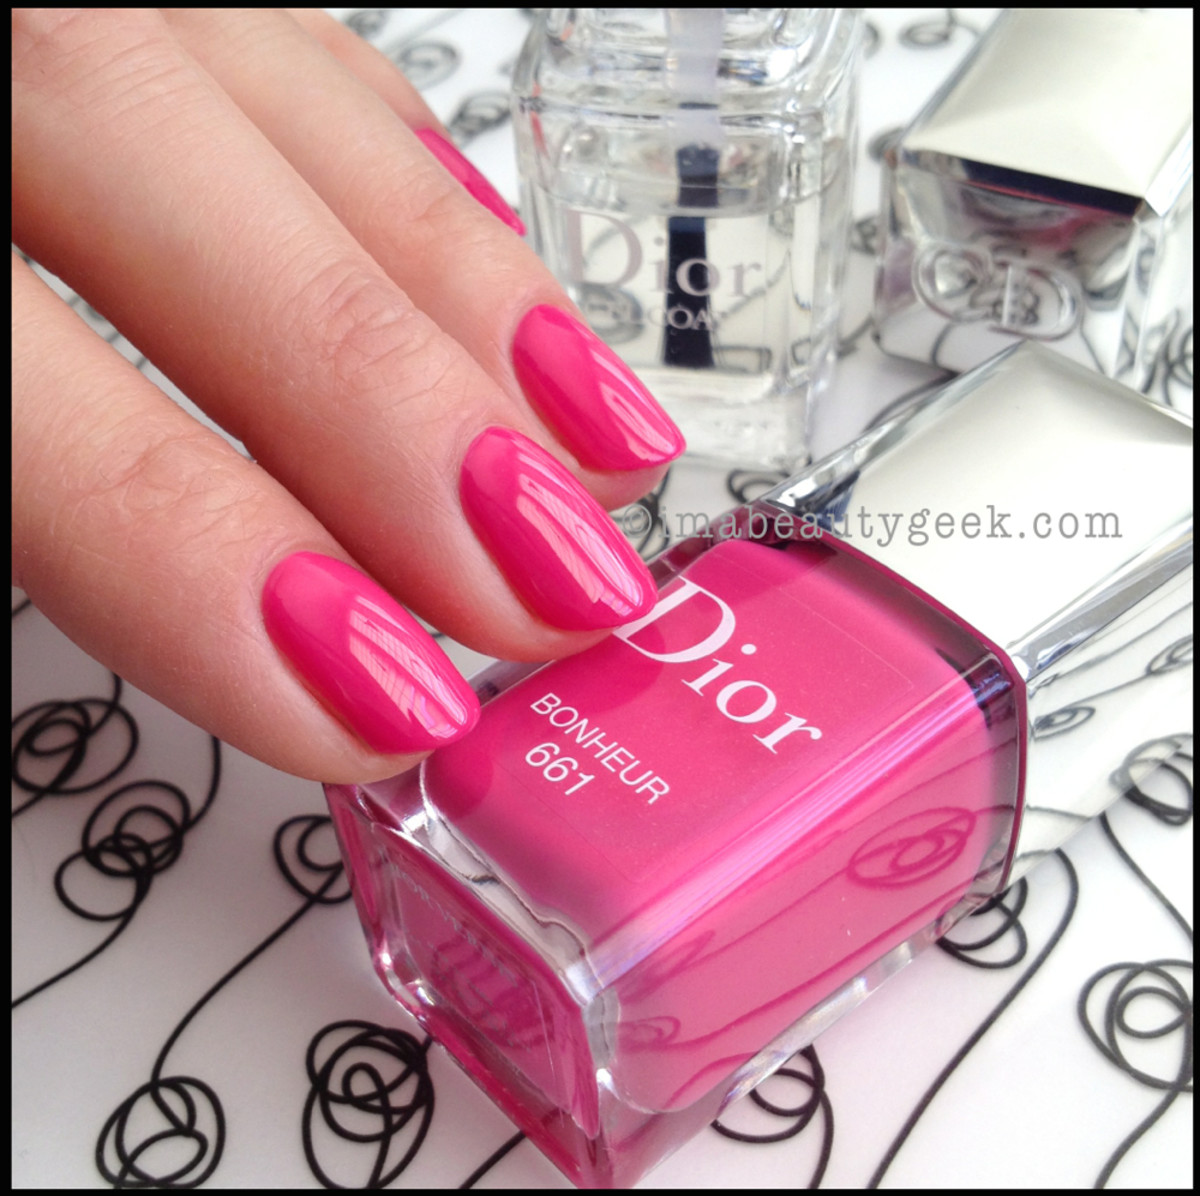 Dior polish Bonheur 661_Dior Gel Shine